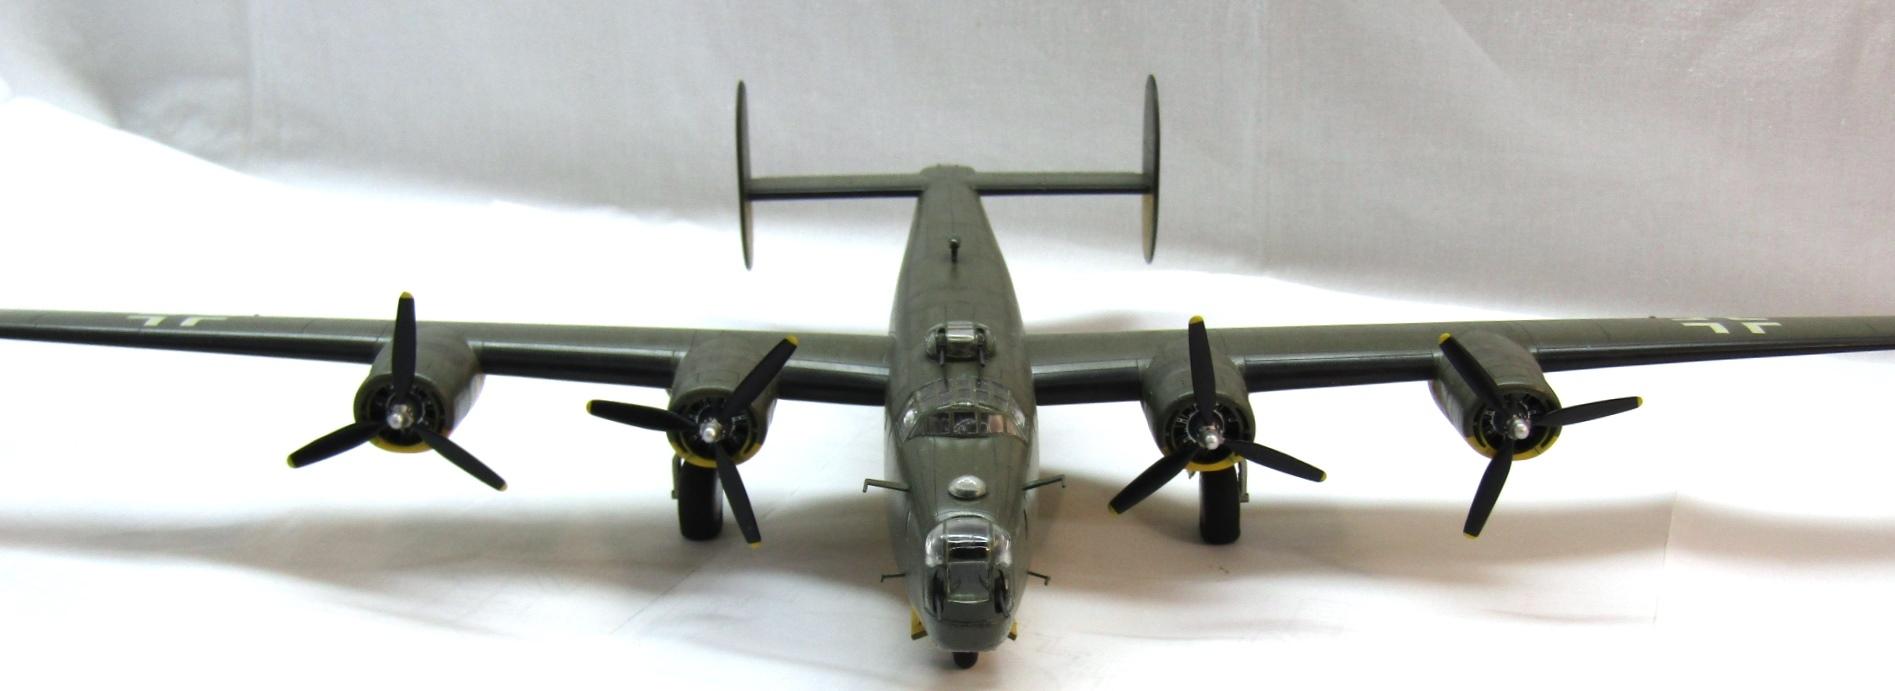 B-24H Liberator 1/72 (Academy) FsMntDJ5TDY